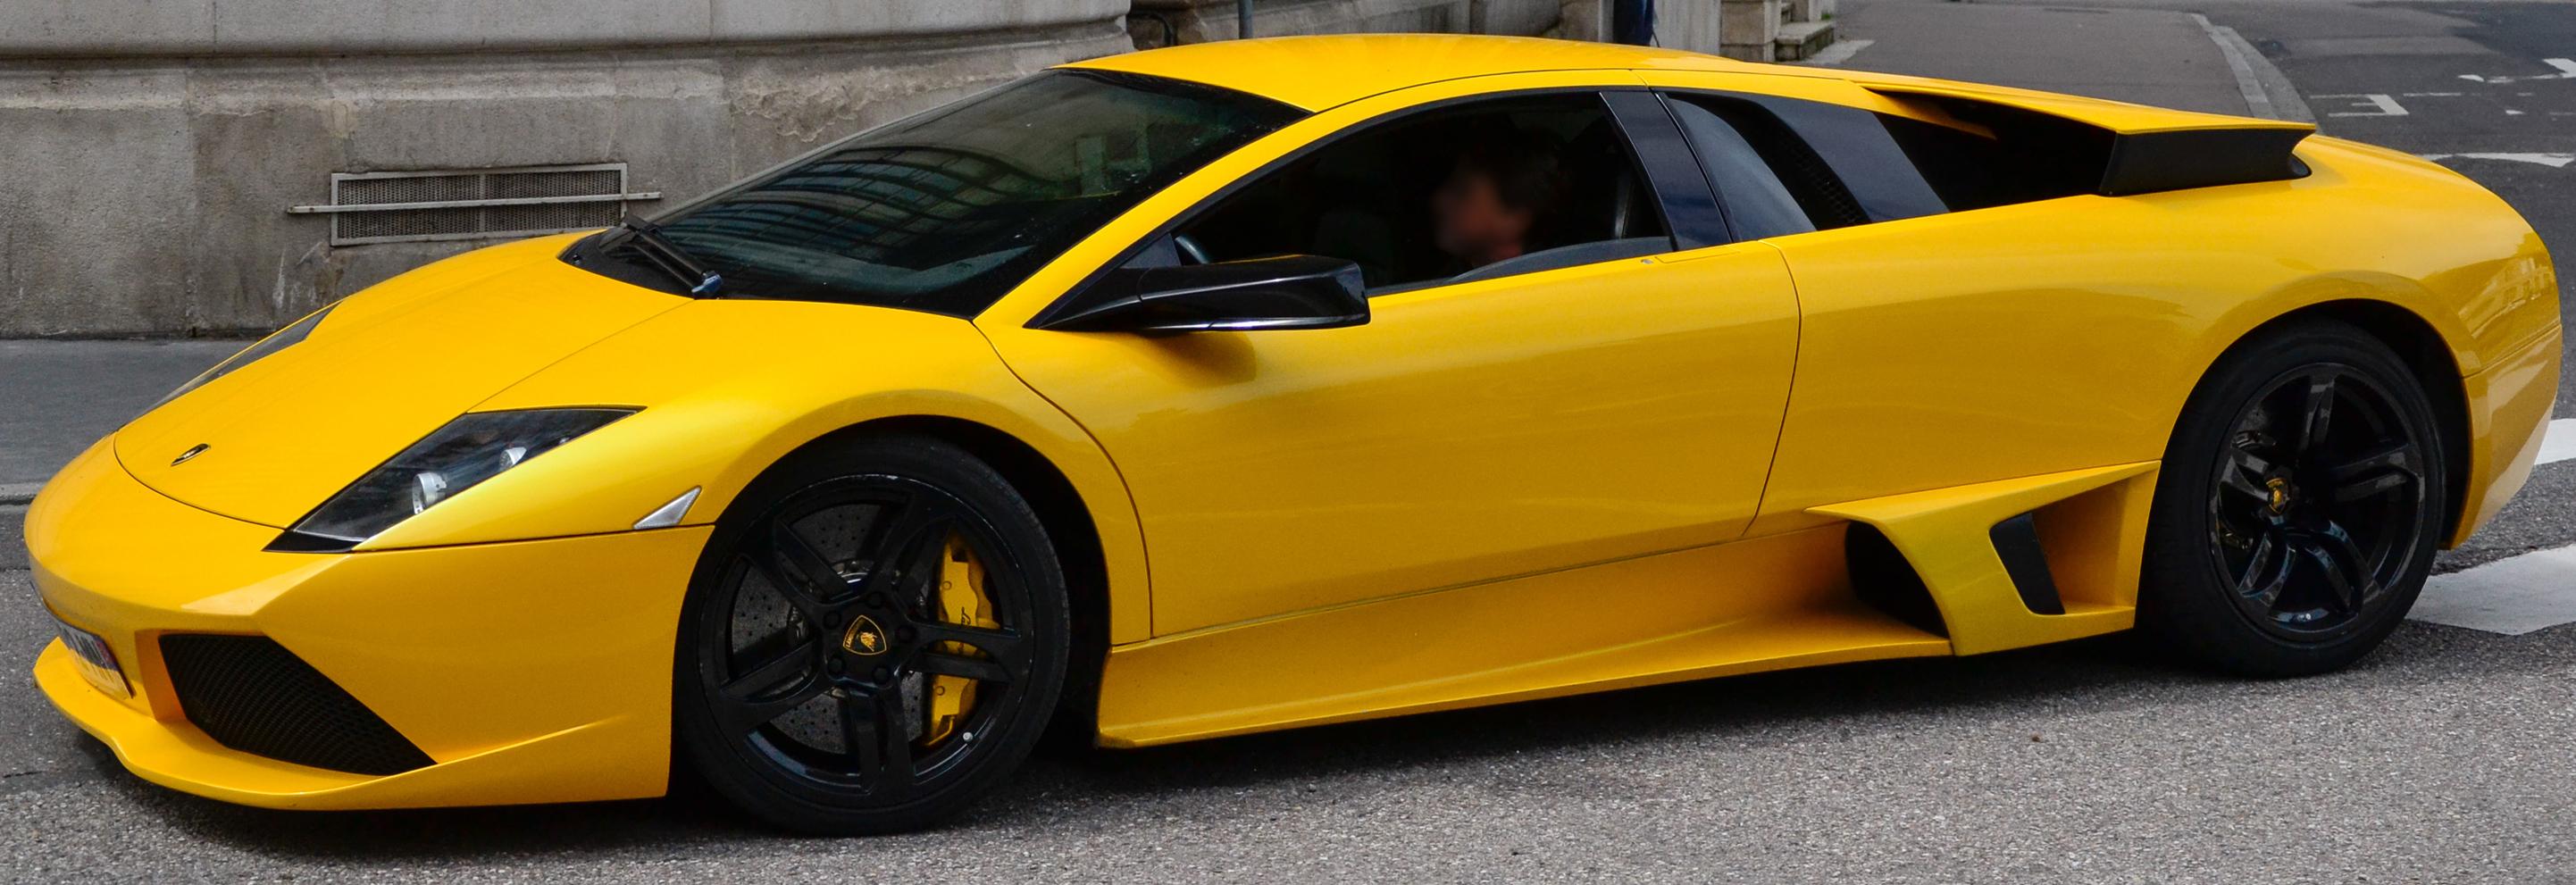 Lamborghini_Murci%C3%A9lago_LP-640_-_Flickr_-_Alexandre_Pr%C3%A9vot_%287%29_%28cropped%29 Breathtaking Lamborghini Countach Owners Manual Pdf Cars Trend